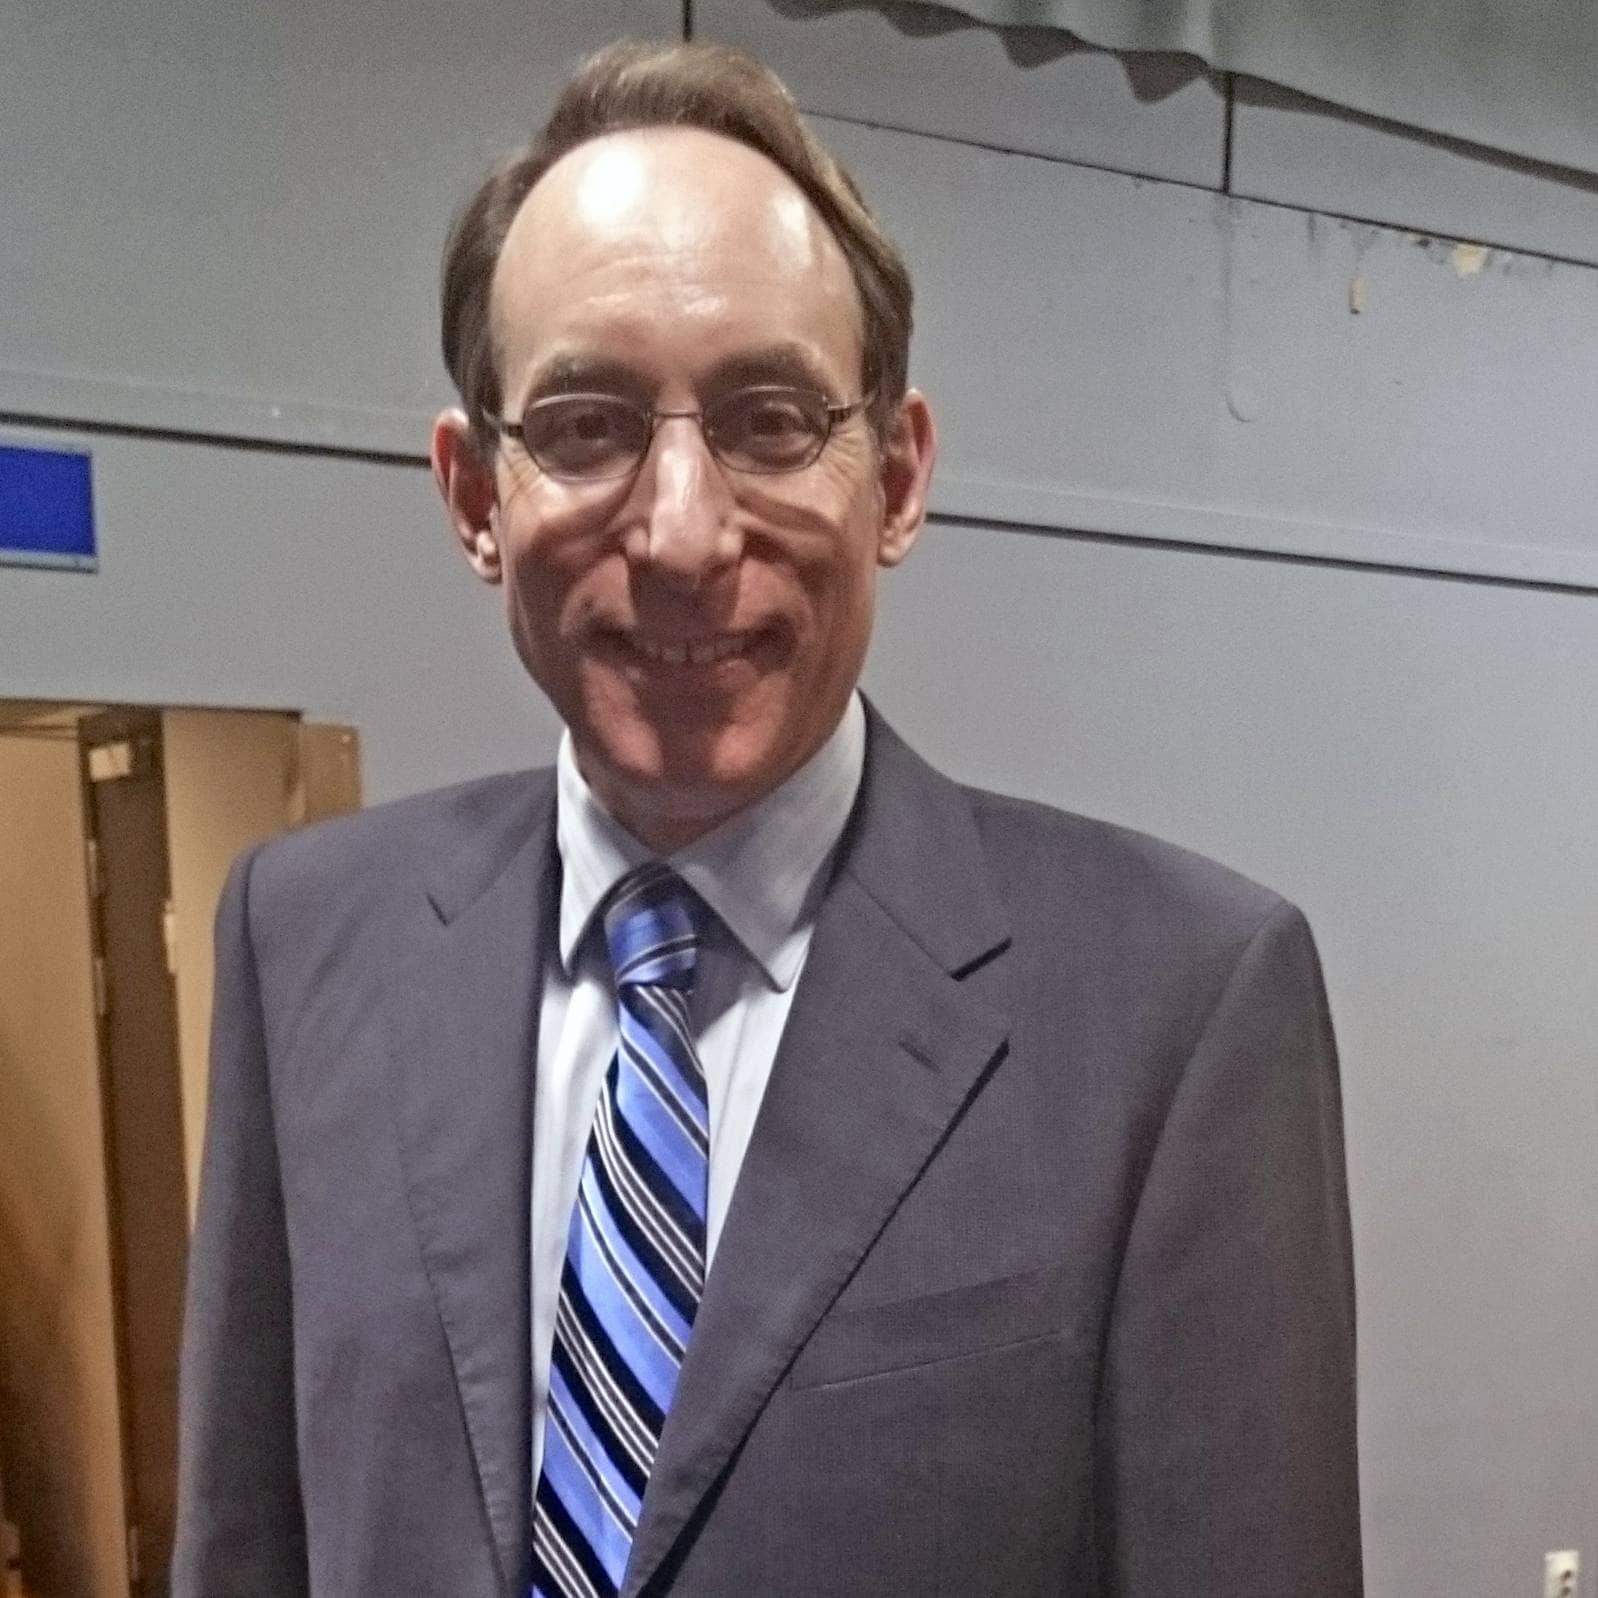 Evan Rosen